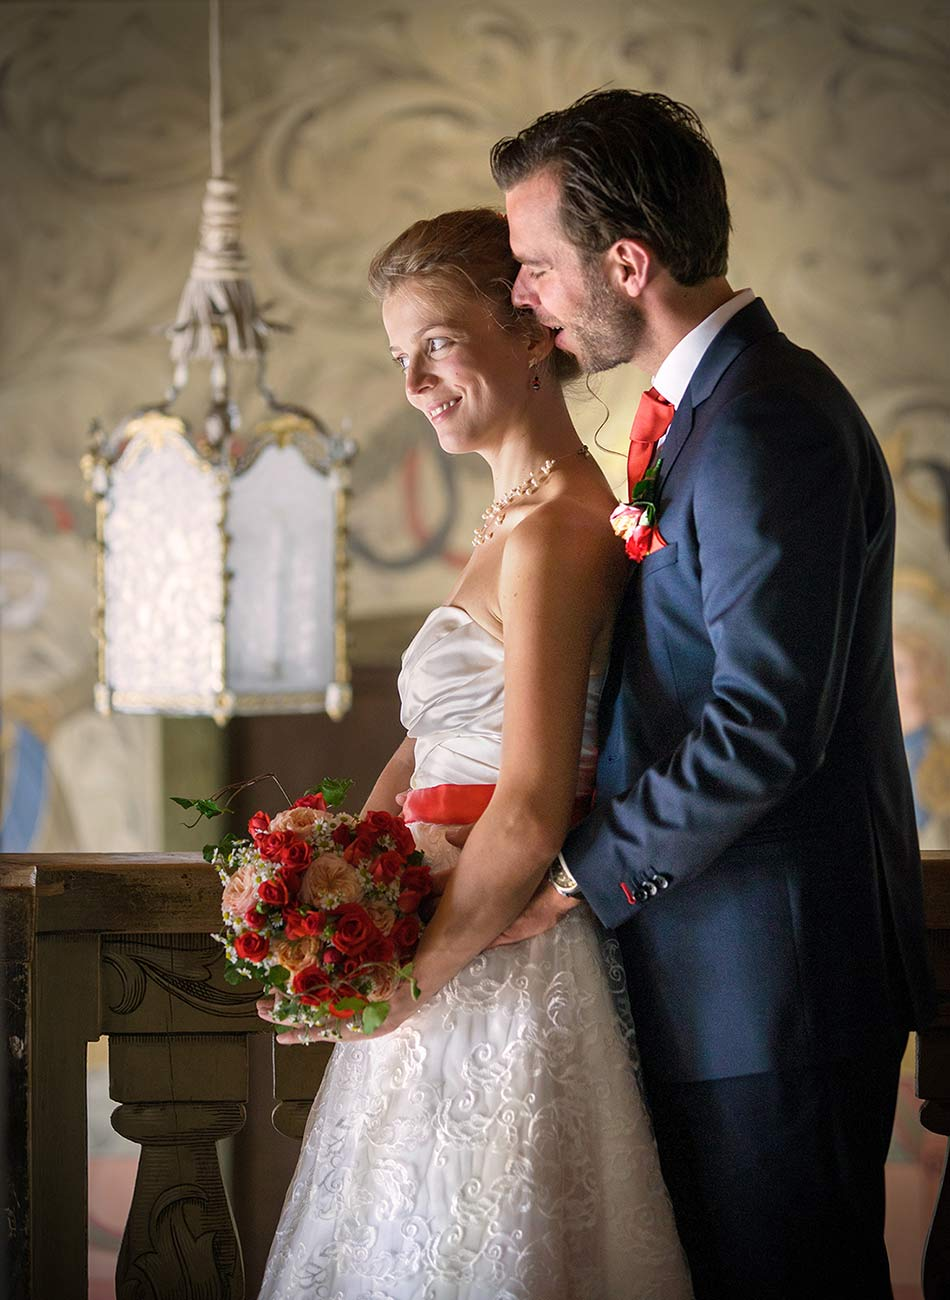 15 svatebni foto zenich a nevesta svatebni fotograf ales motejl jizni cechy